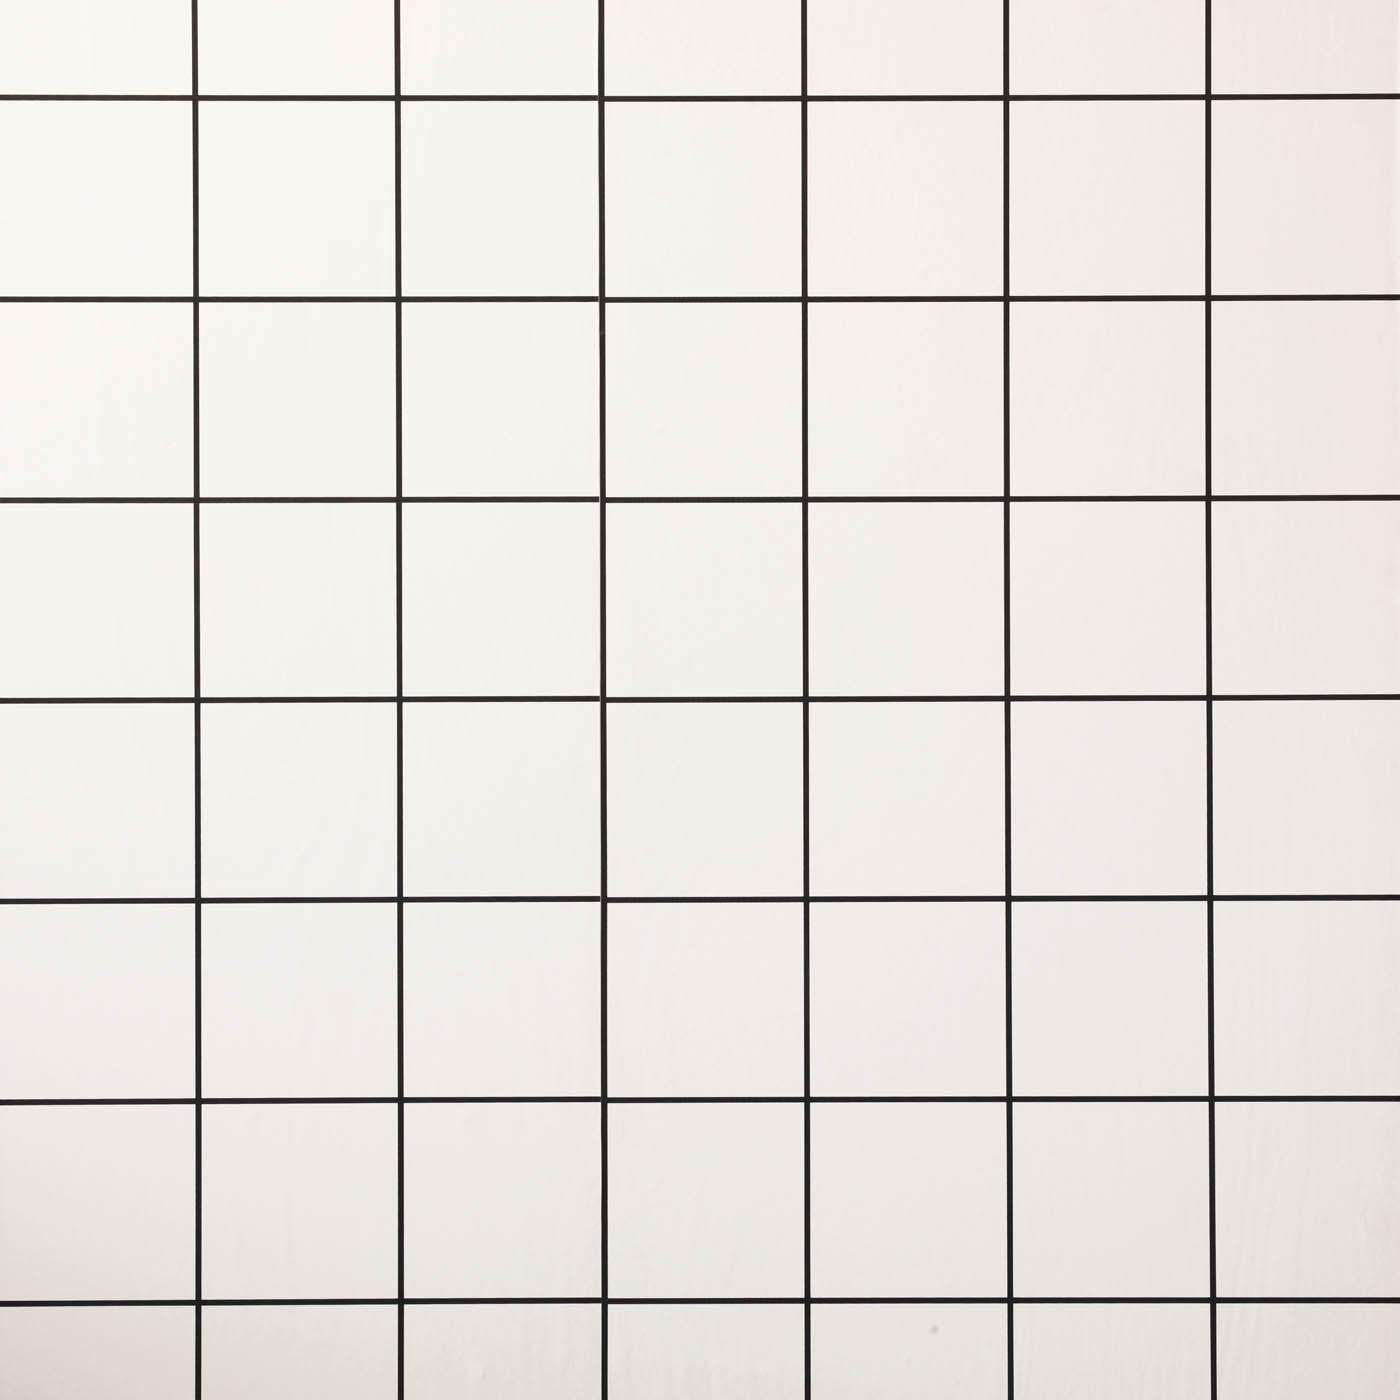 Floral Grid Wallpaper